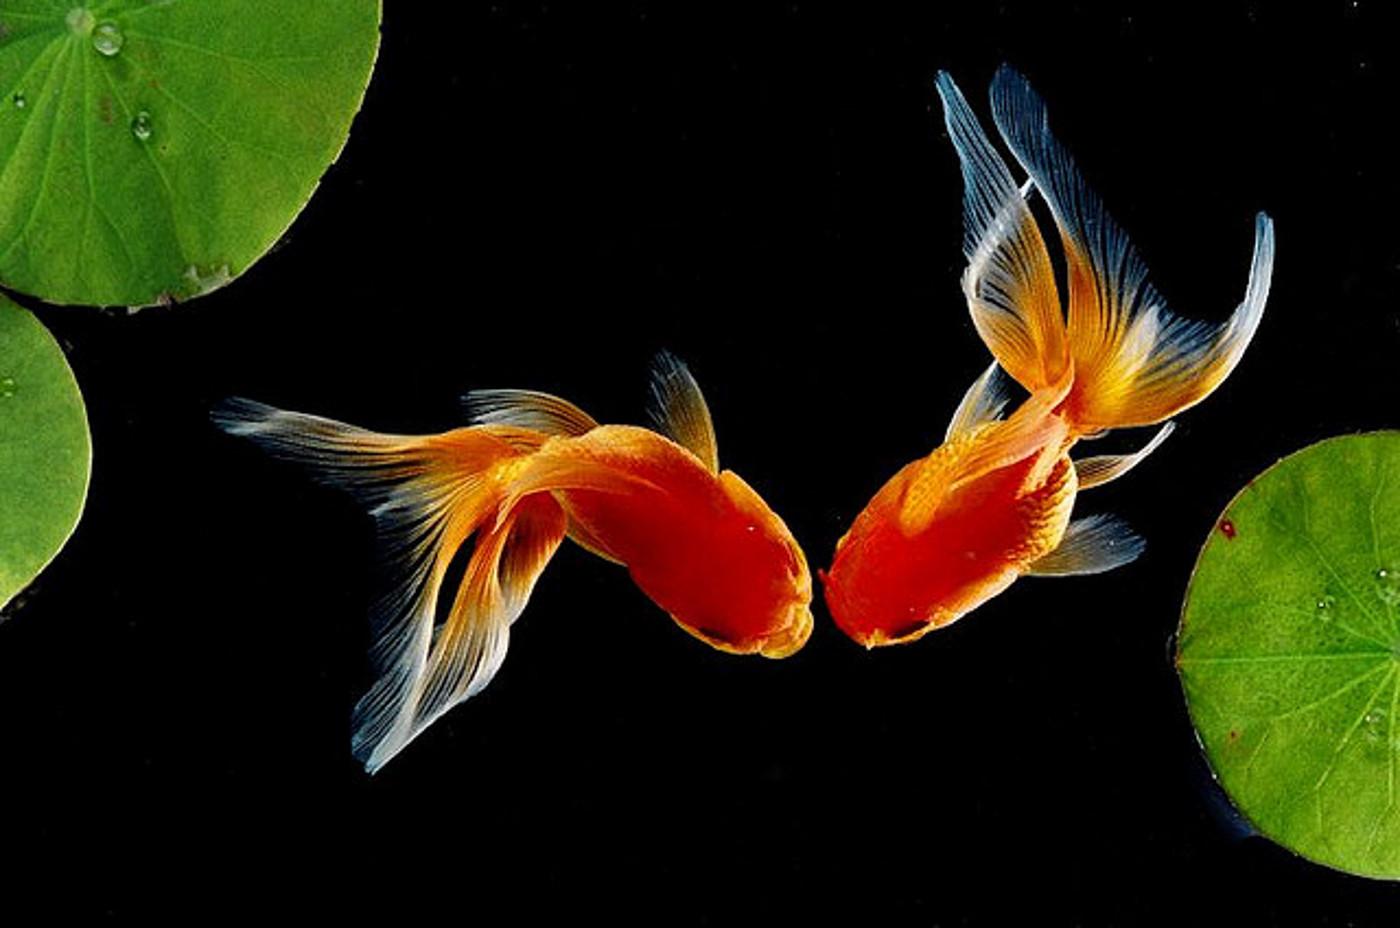 goldfish wallpaper 17205 hd wallpapersjpg 1400x928